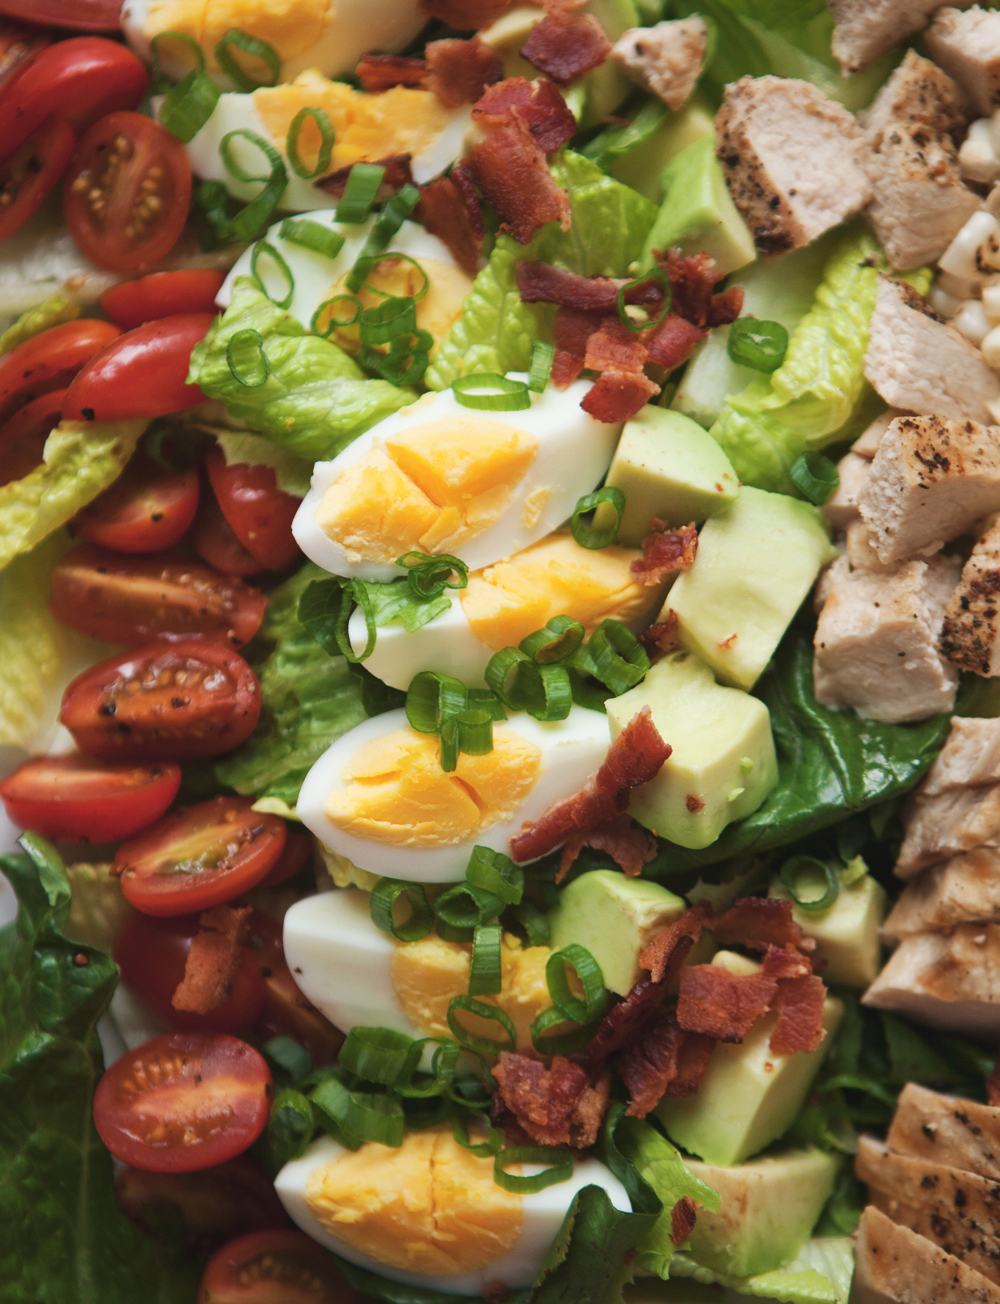 a-Better-Happier-St-Sebastian_Summer-Cobb-Salad-with-Green-Goddess-Dressing_127.jpg